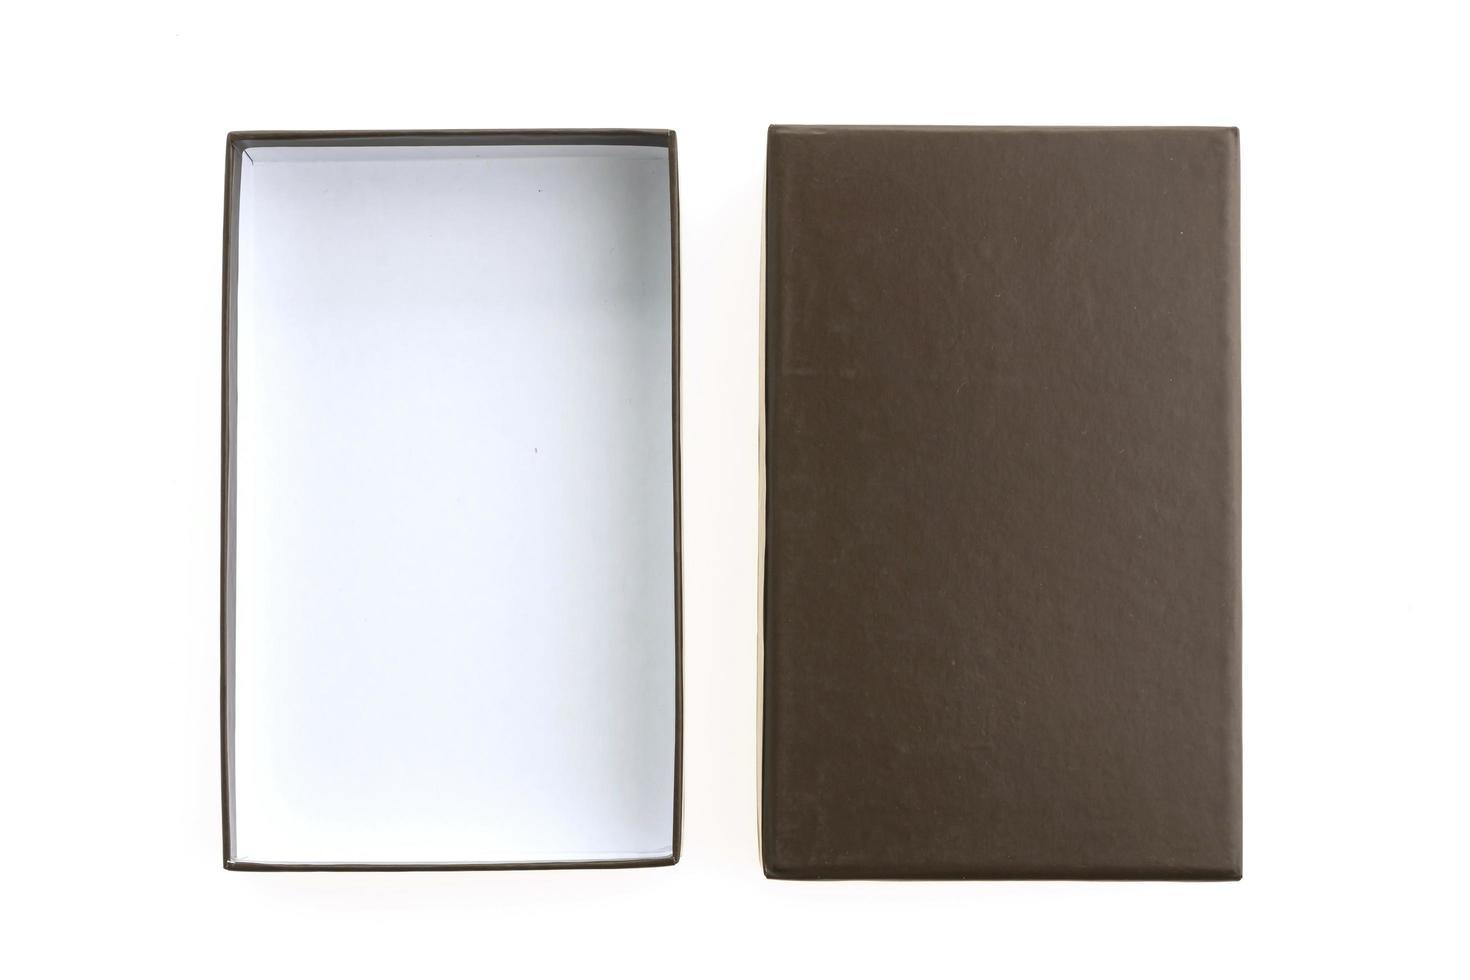 tom svart låda på vit bakgrund foto